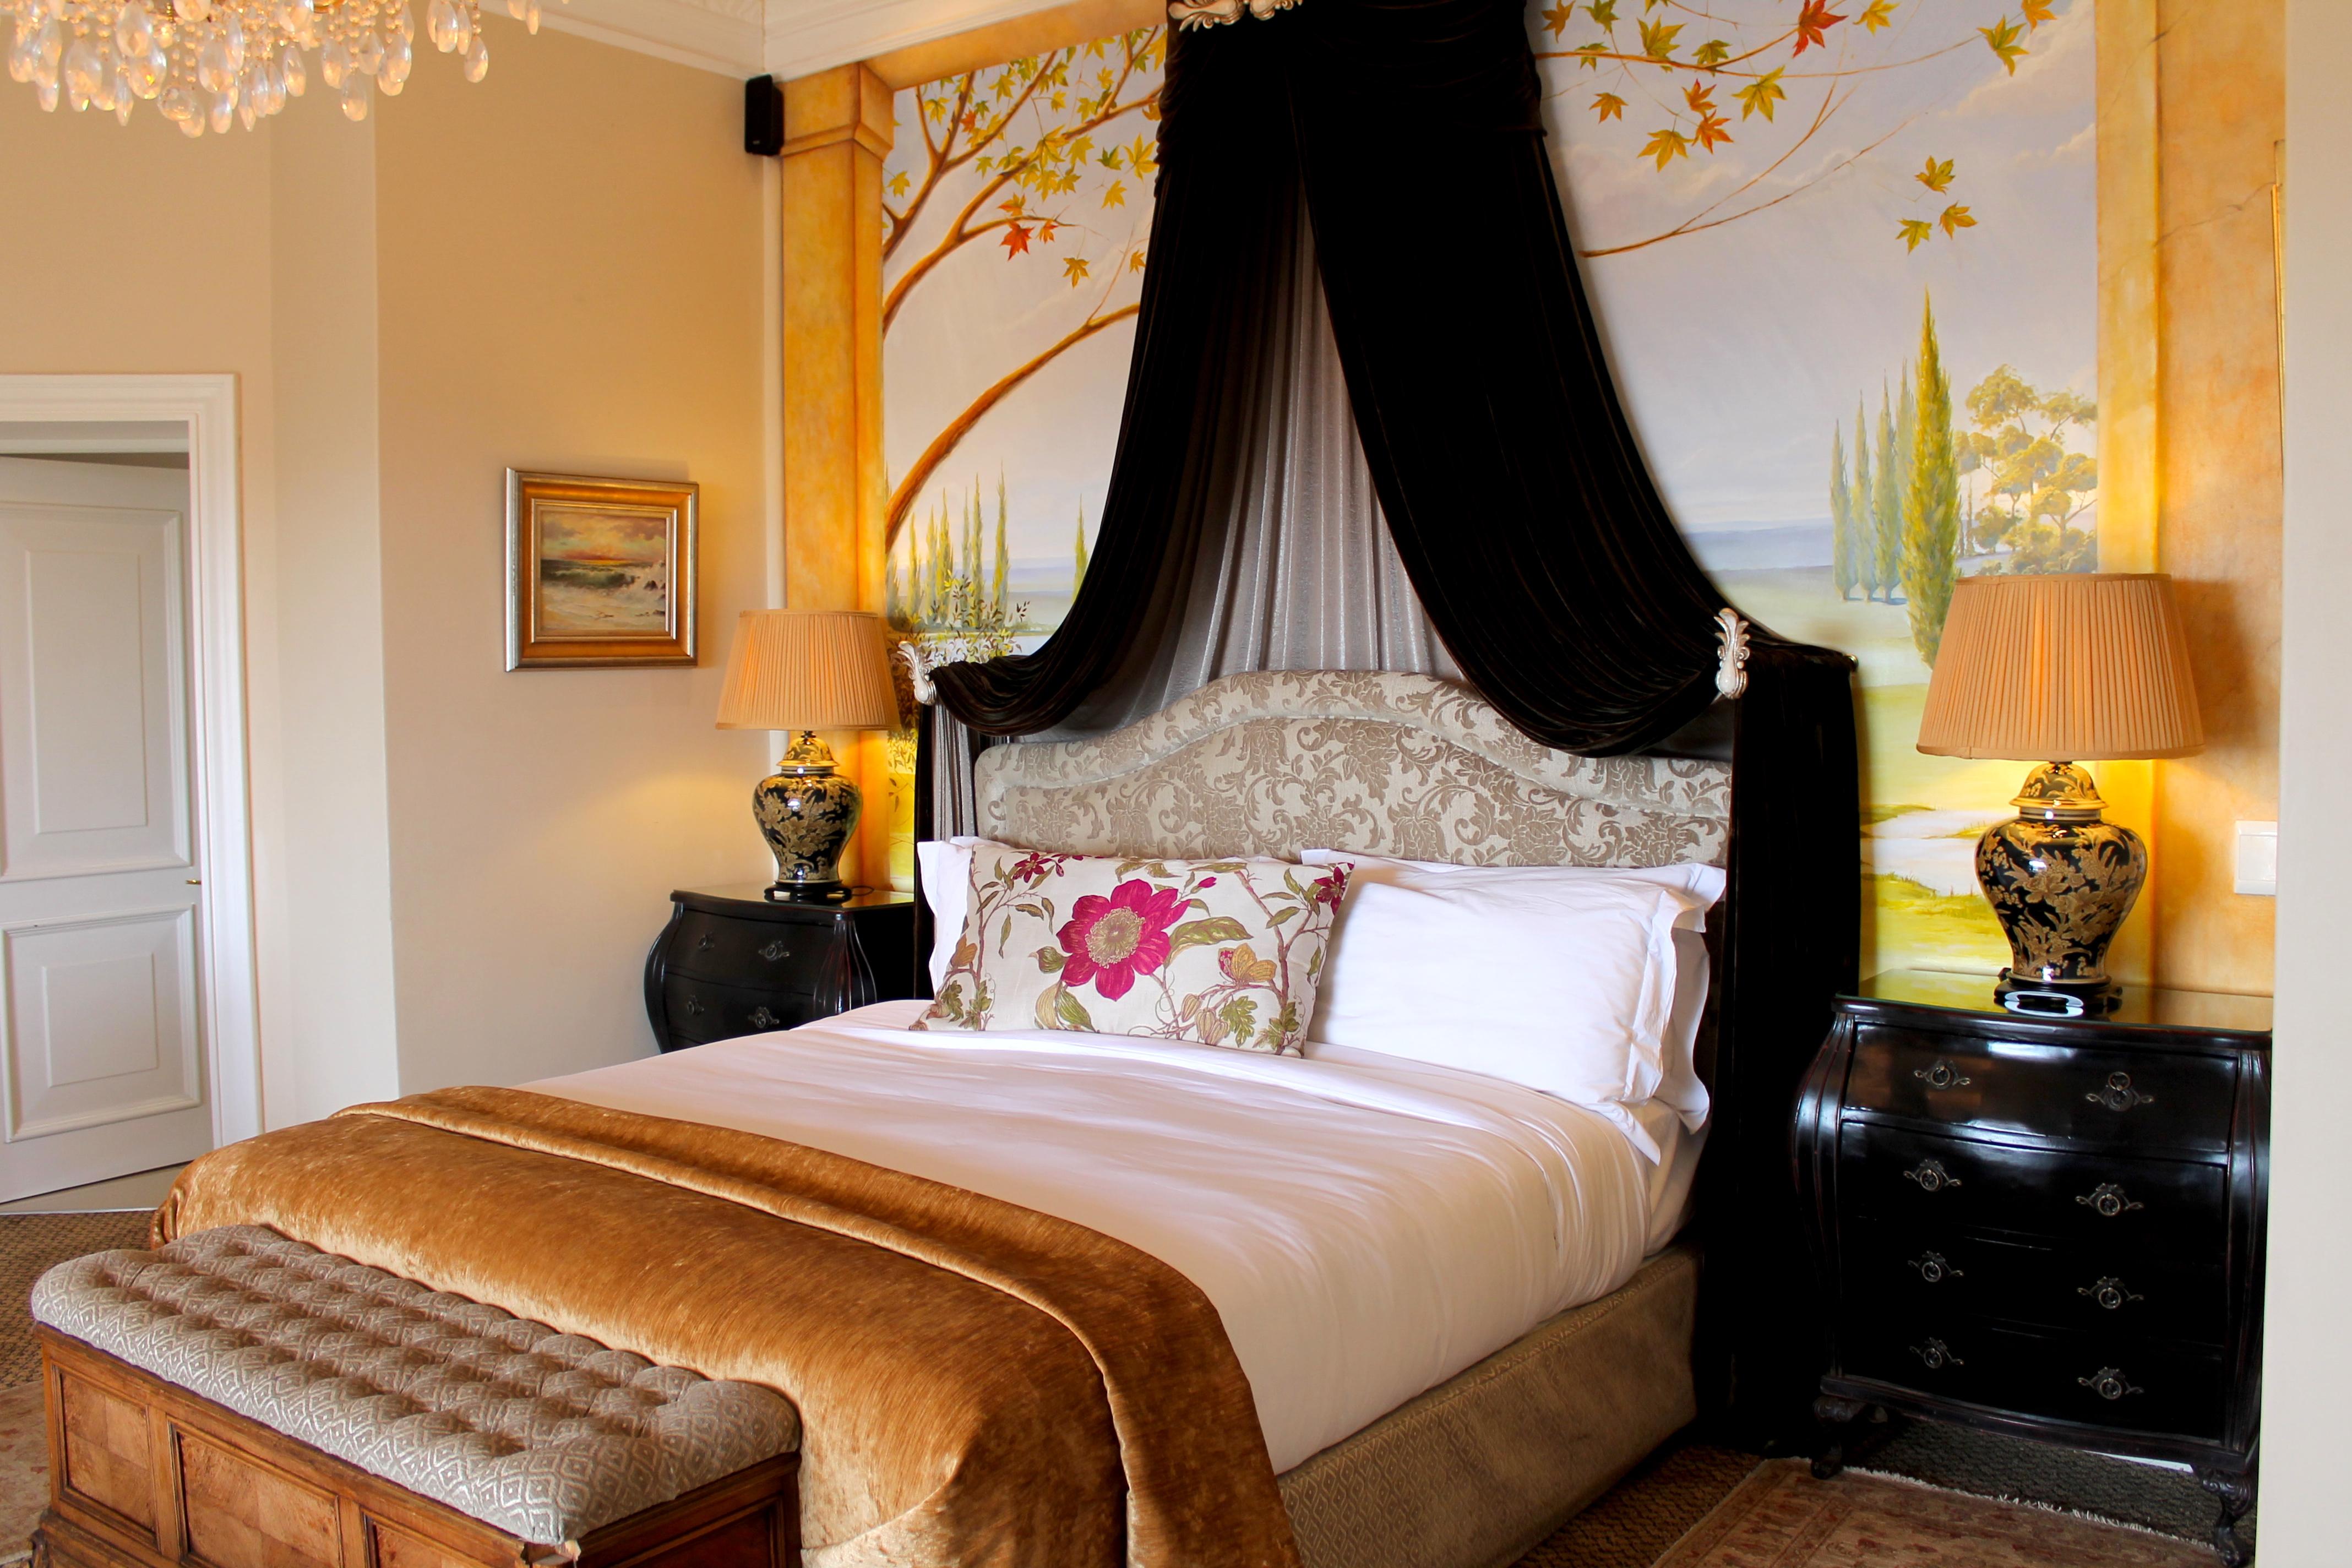 baobab-suite-munro-hotel-johannesburg-lustforthesublime